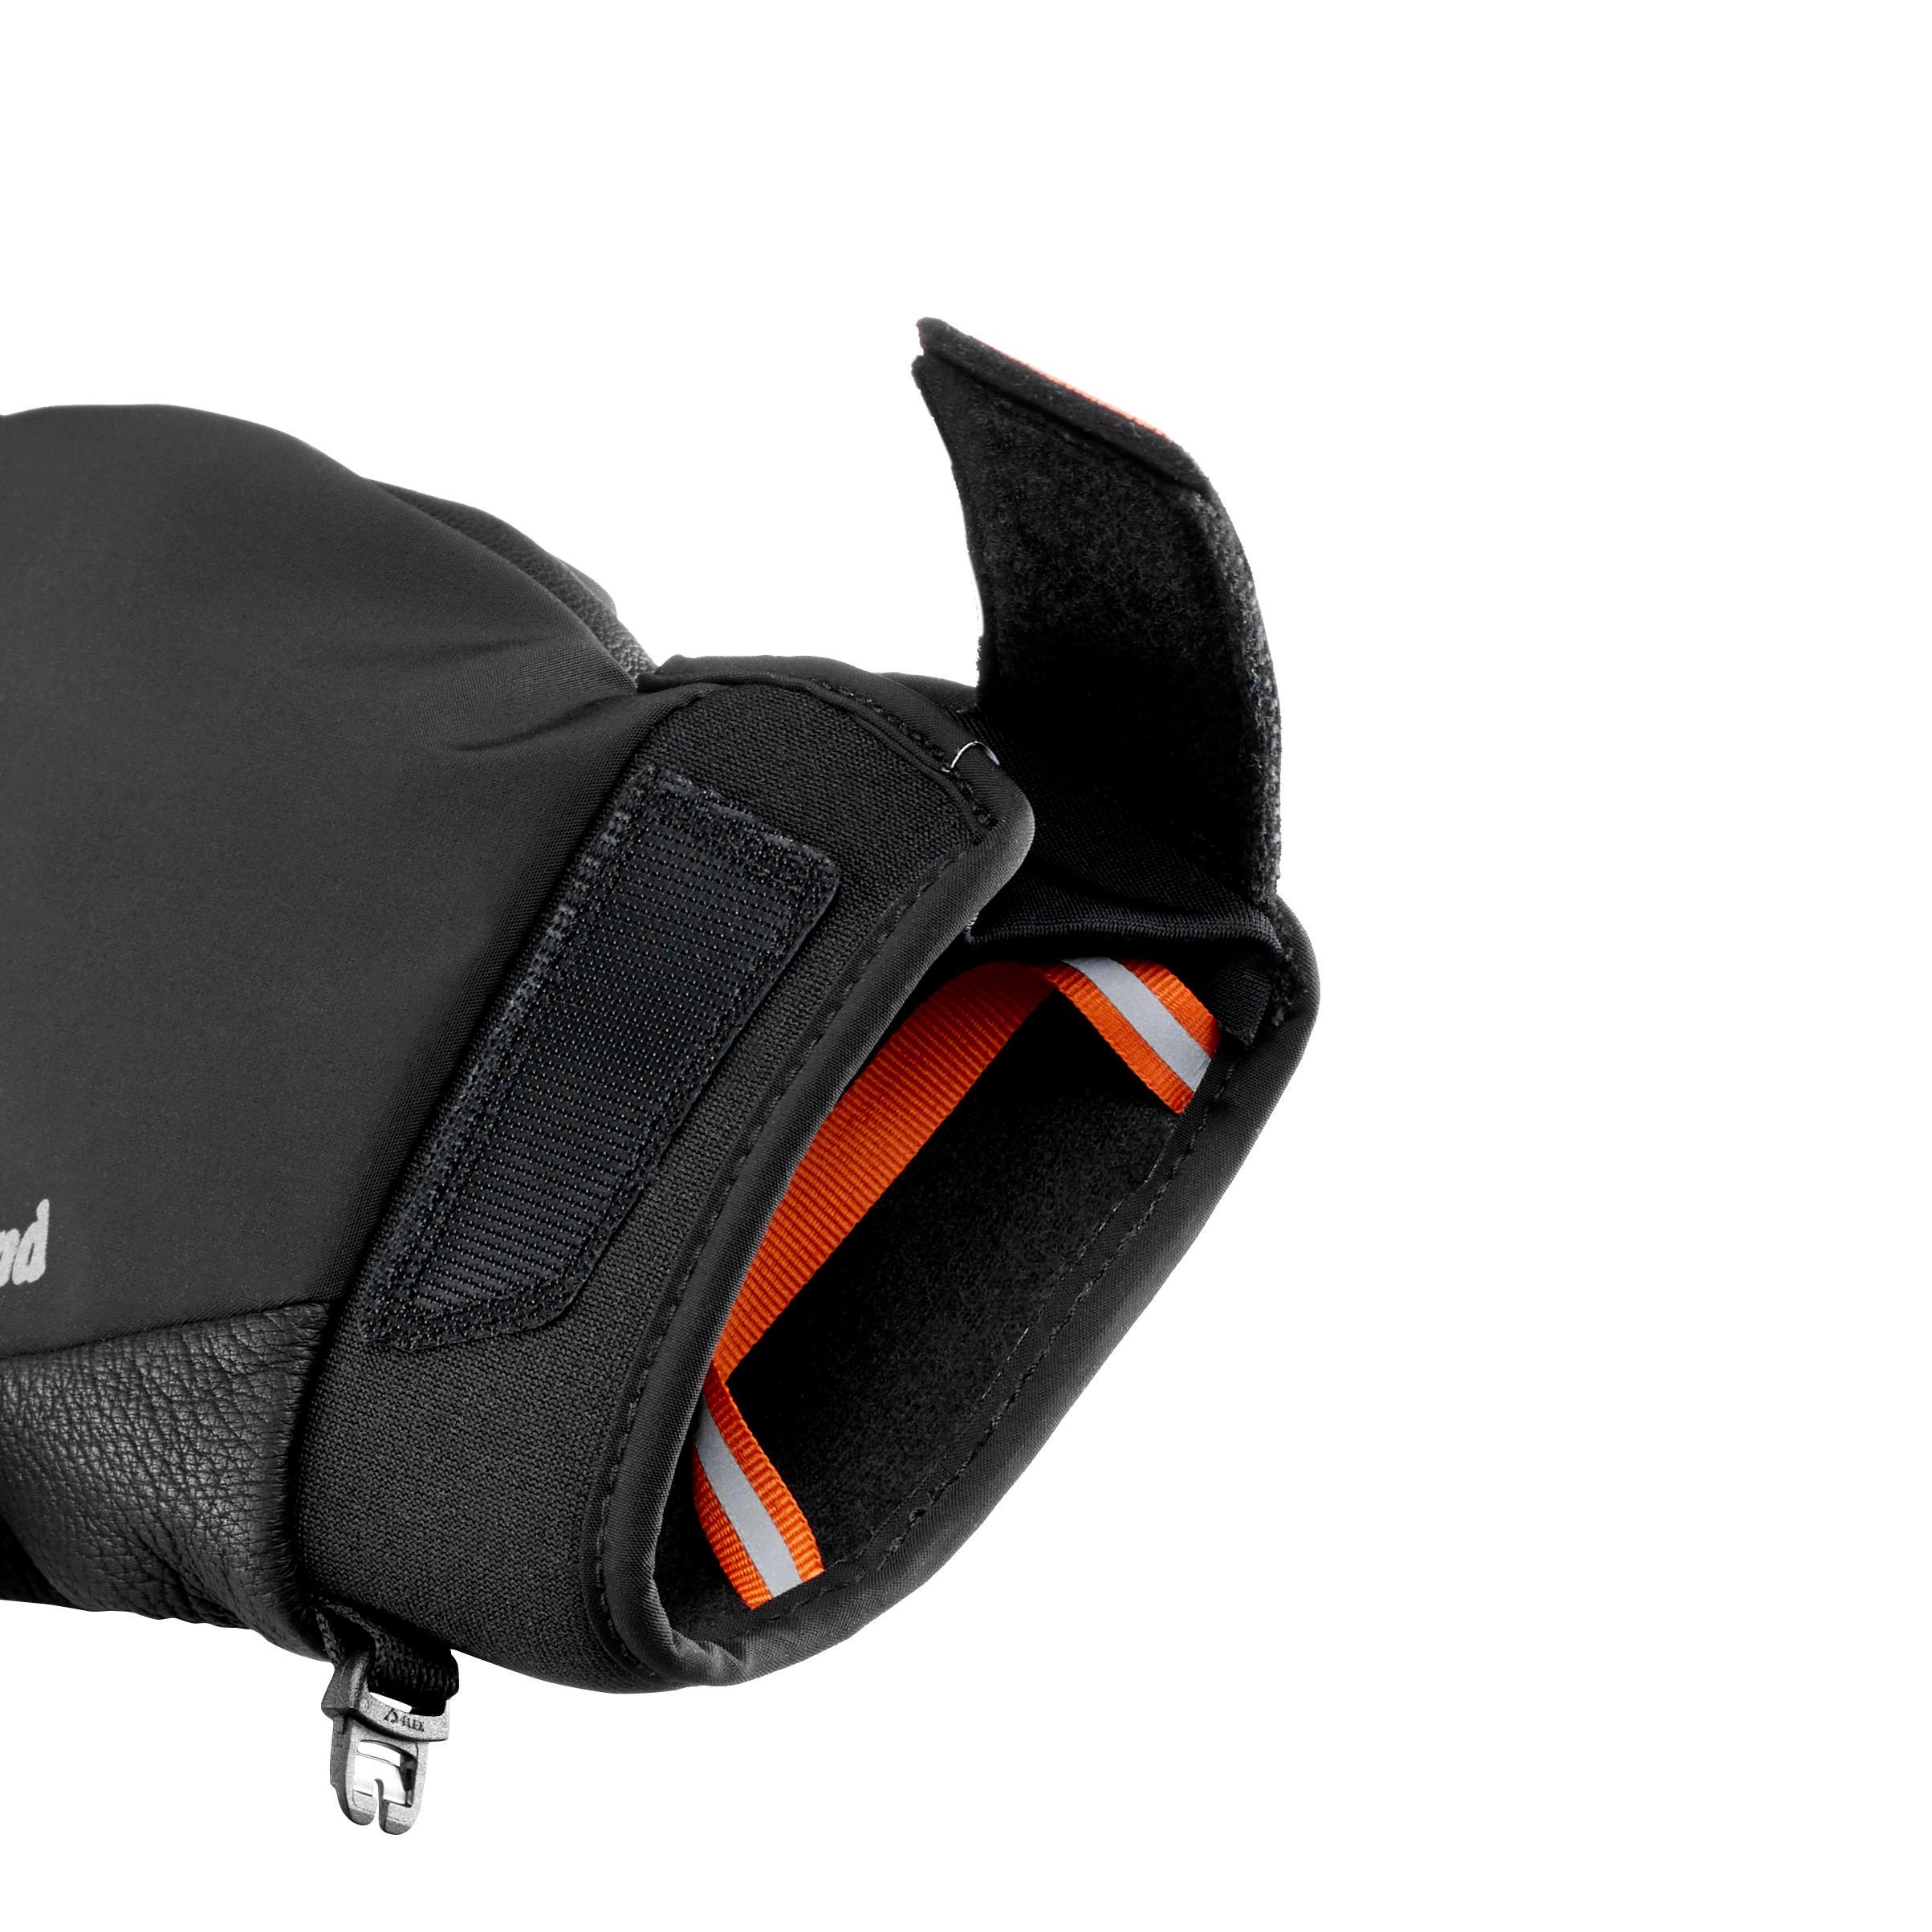 Mountaineering Waterproof Gloves - Sprint - S By SIMOND   Decathlon